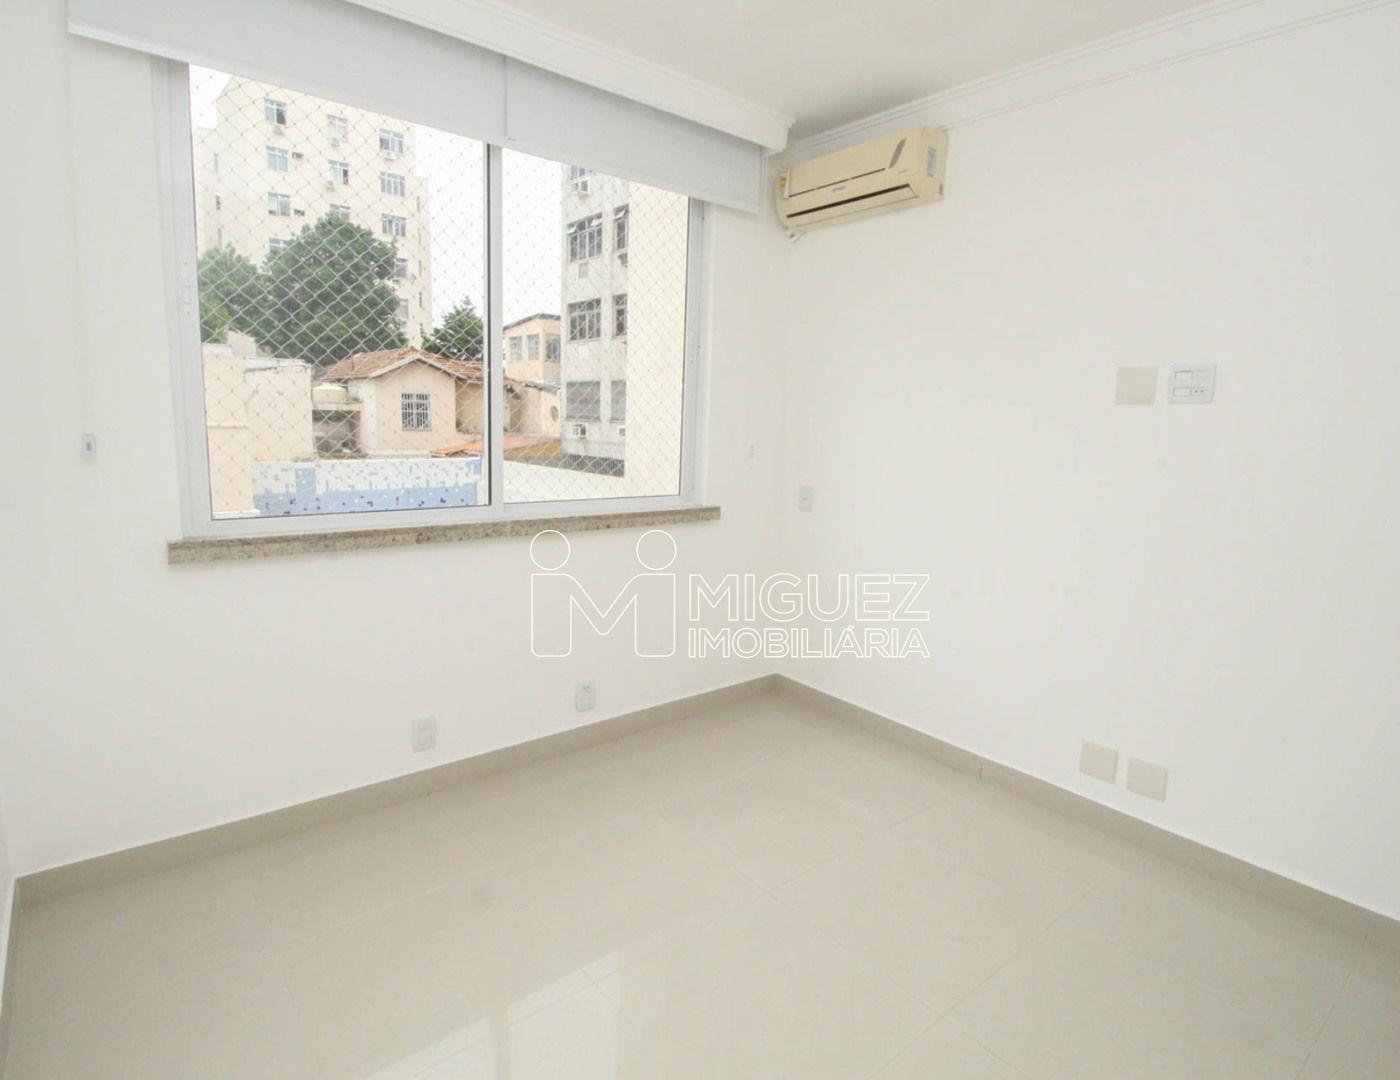 Apartamento, venda, Avenida Melo Matos - Tijuca , Rio de janeiro